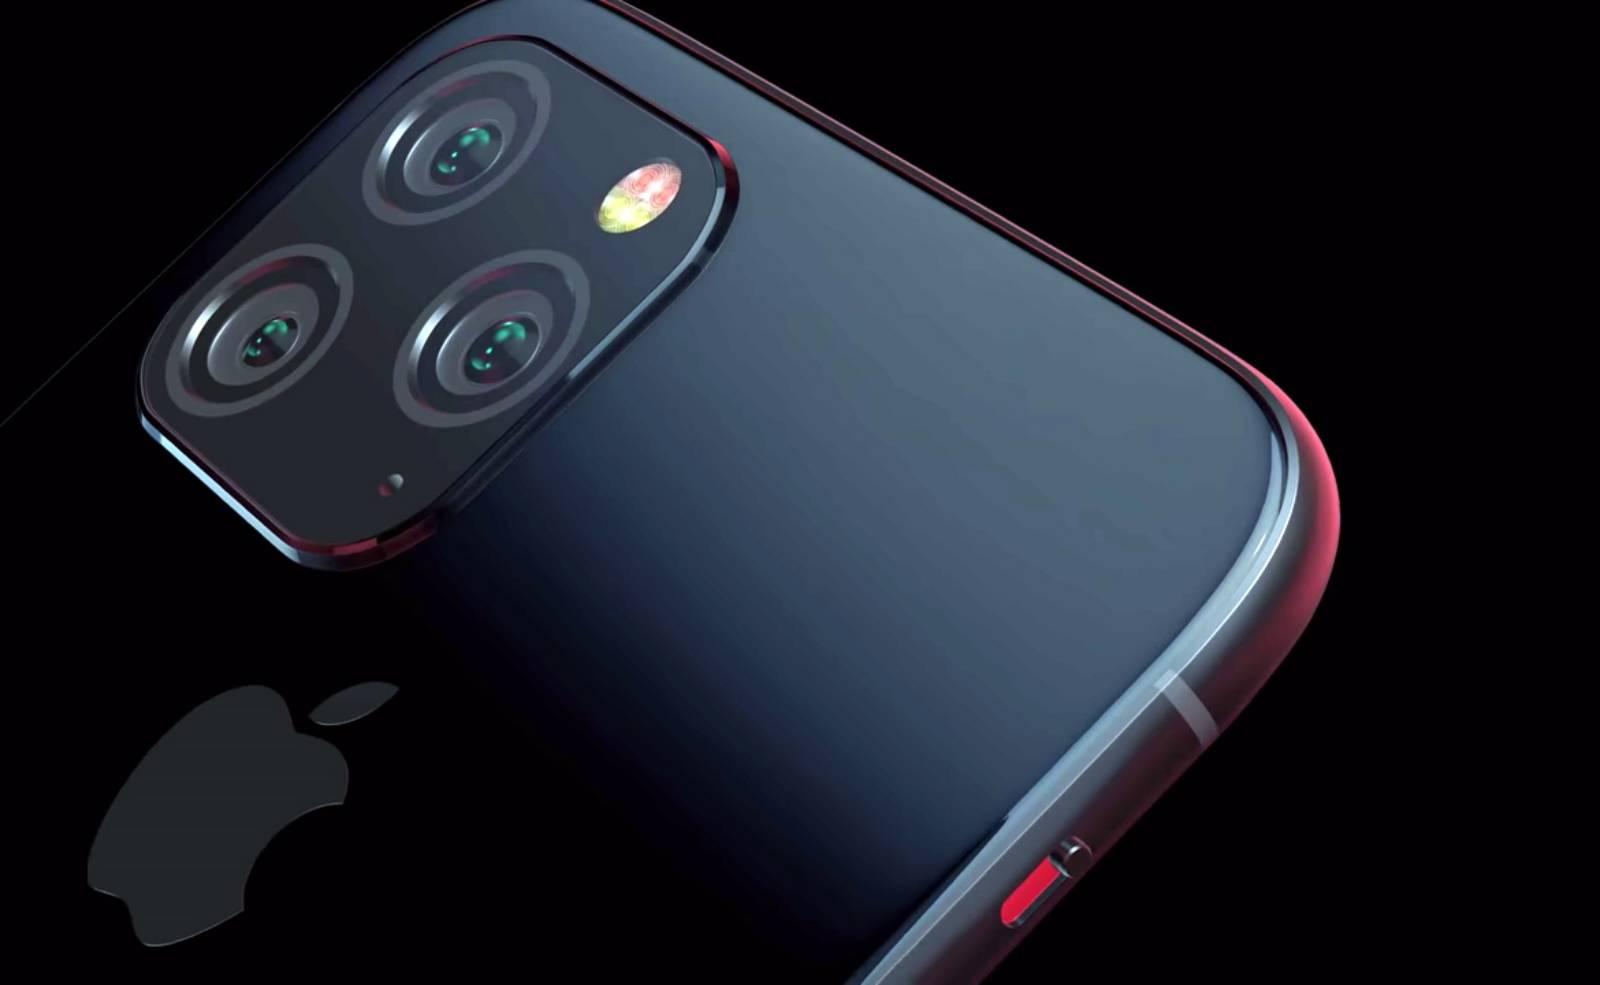 LANSARE iPhone 11 e in ACEEASI ZI cu a Samsung GALAXY FOLD